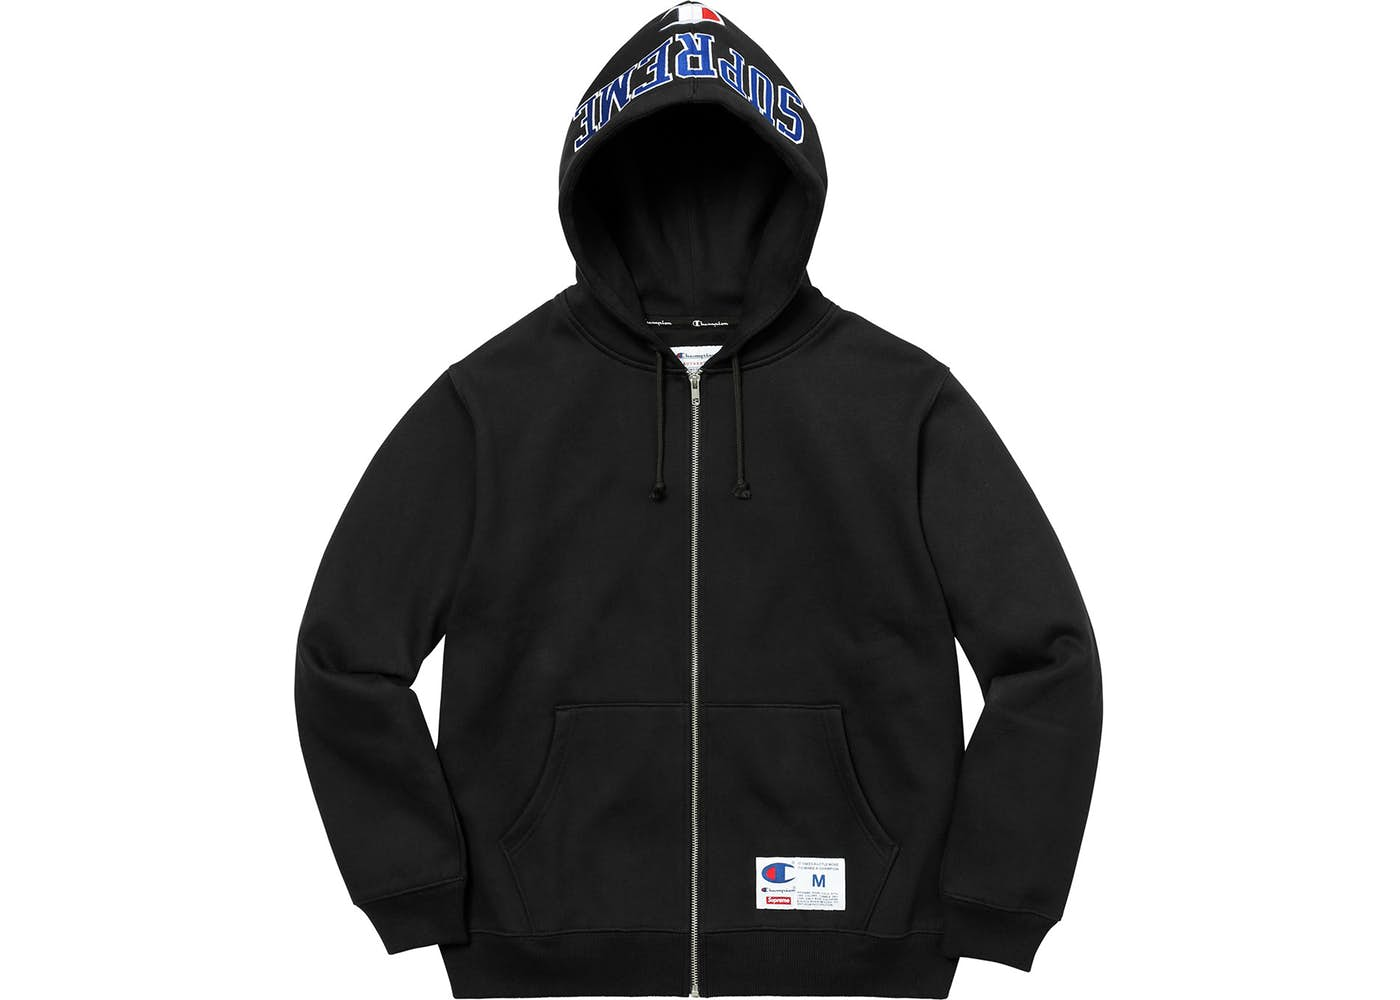 582e1401a6e5 Supreme Champion Arc Logo Zip Up Sweat Black Fall Winter 2017